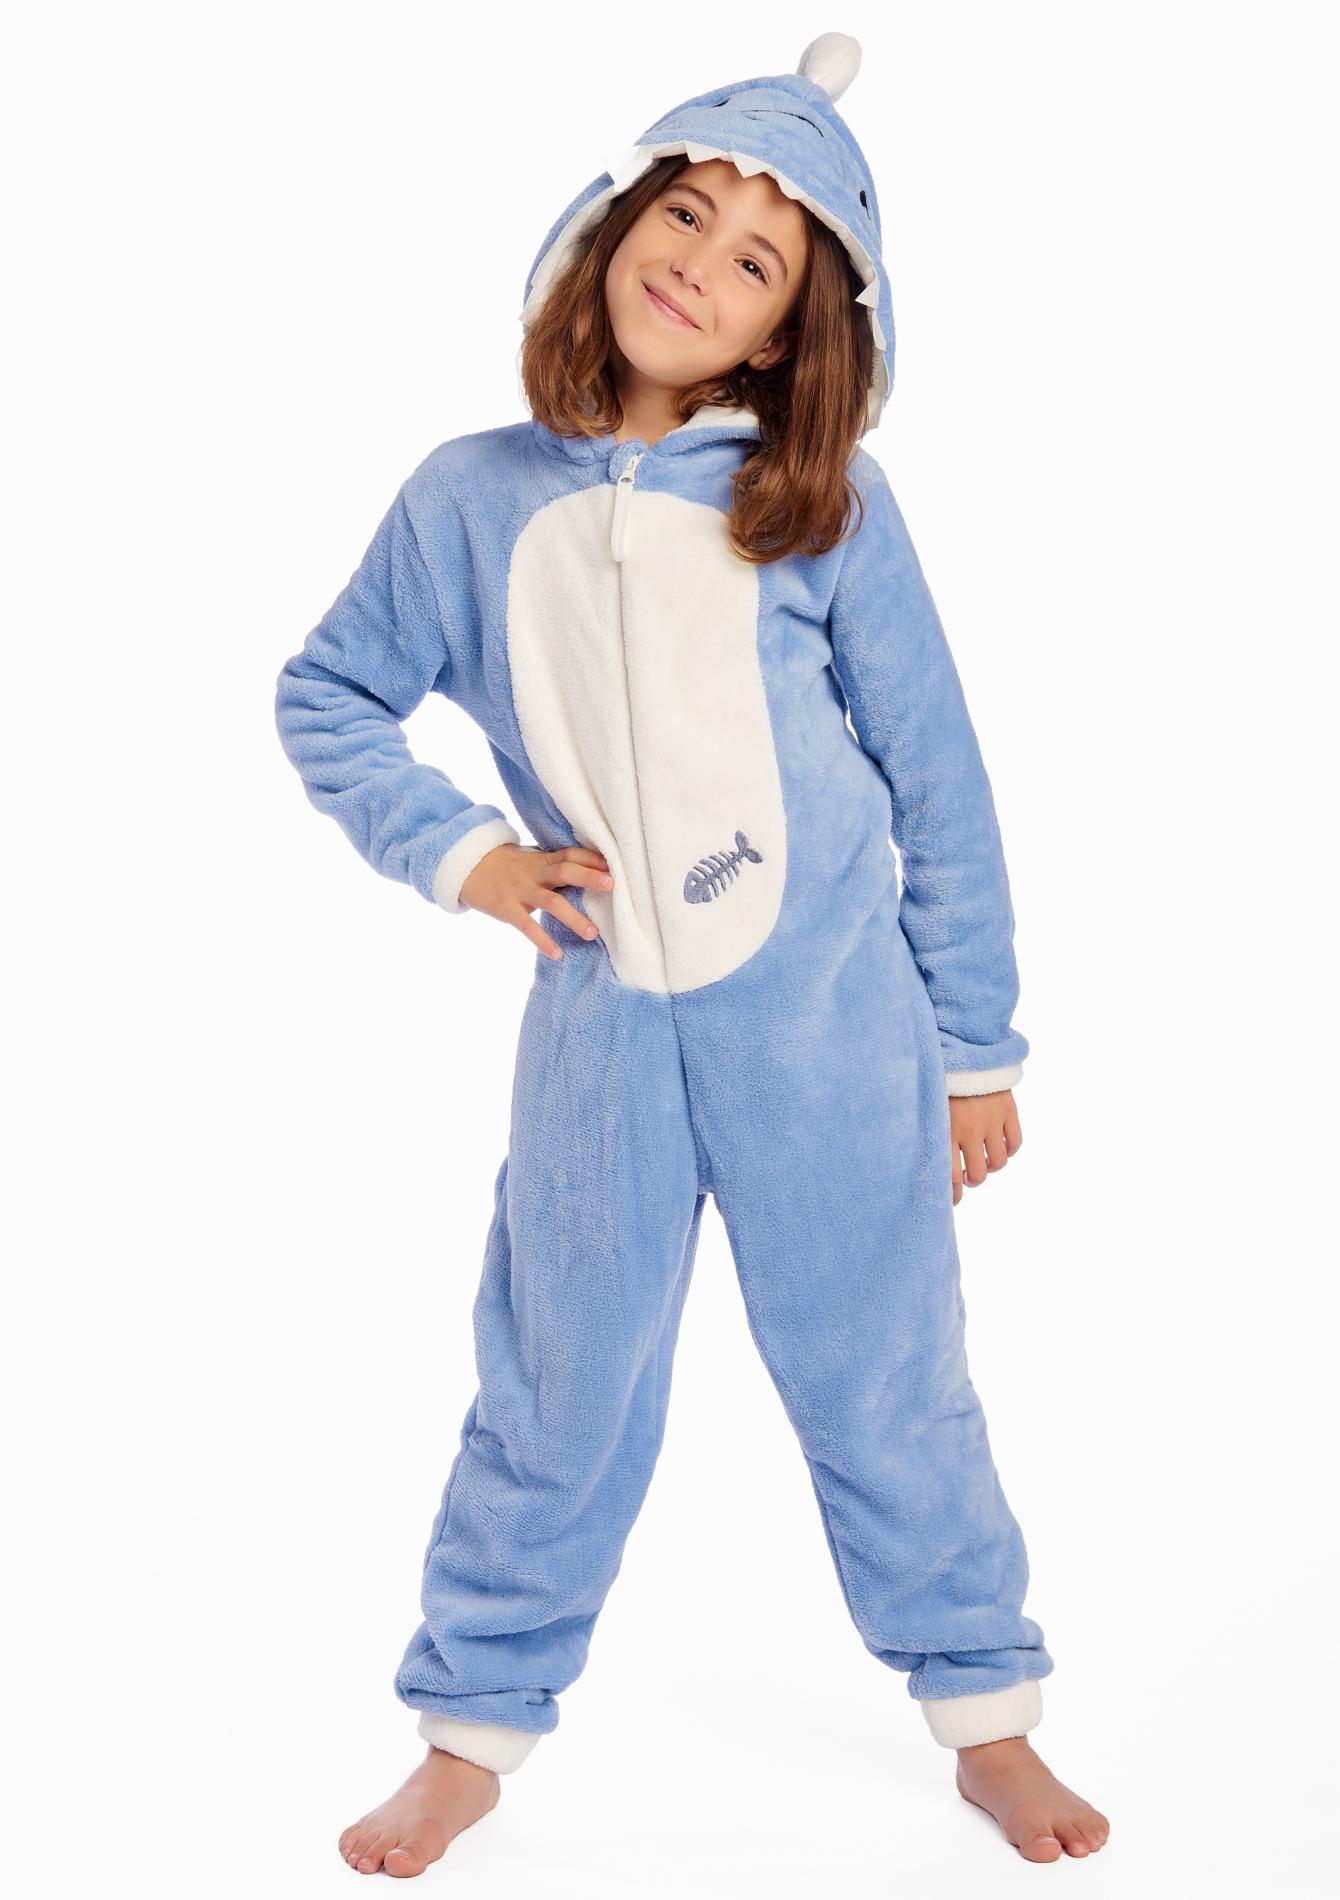 combinaison pyjama enfant style requin lolaliza. Black Bedroom Furniture Sets. Home Design Ideas